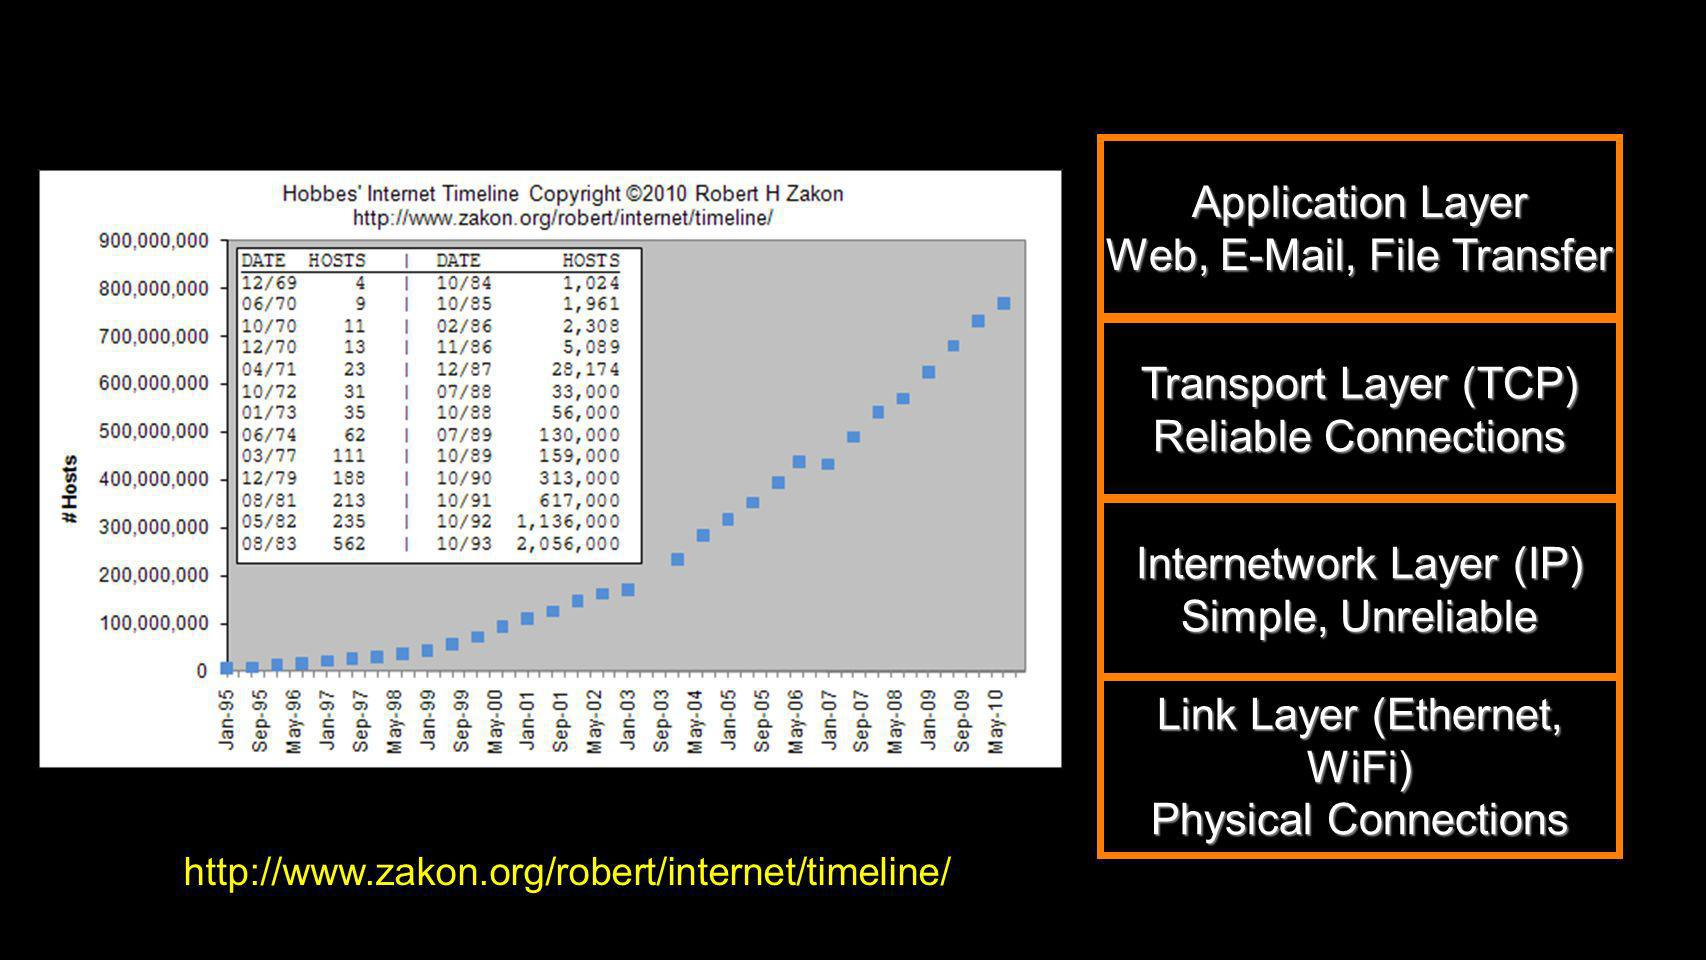 Web, E-Mail, File Transfer